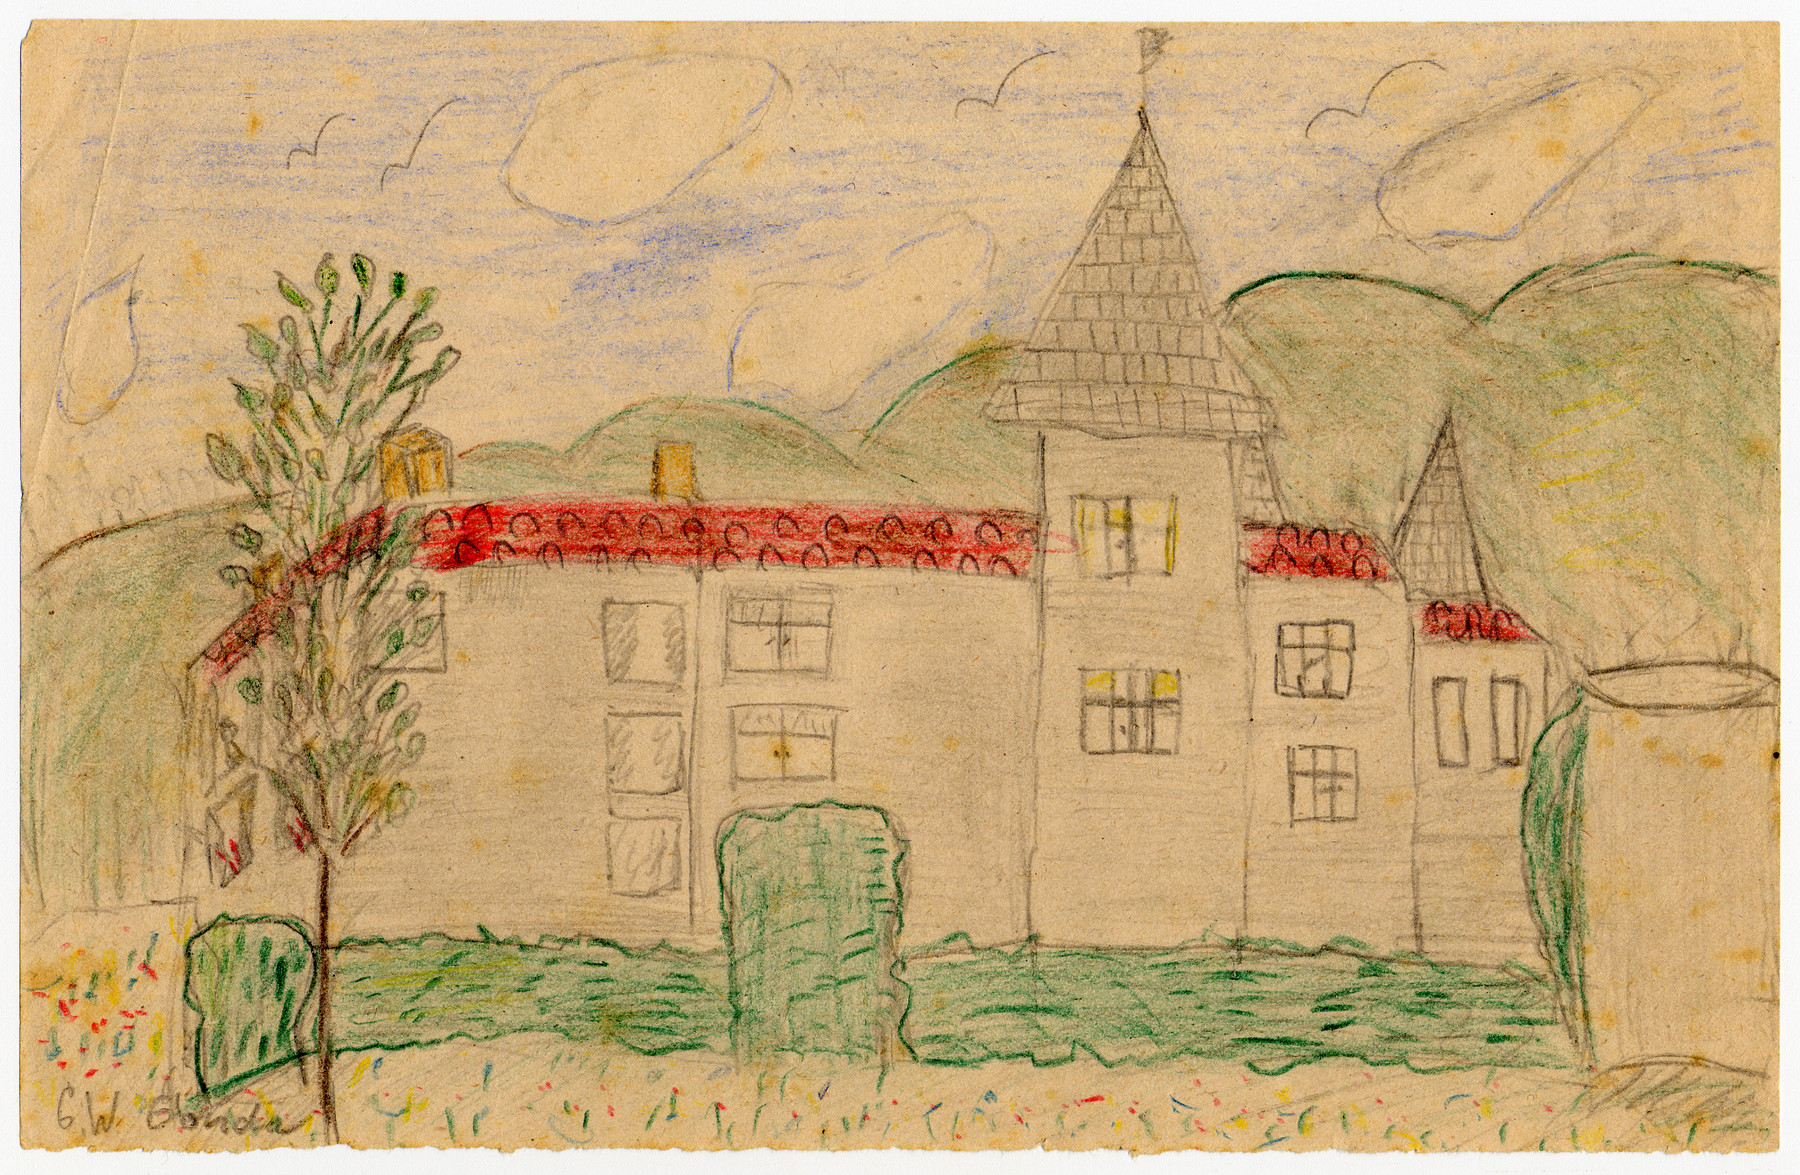 Color child's drawing of an exterior view of Chateau de la Hille.